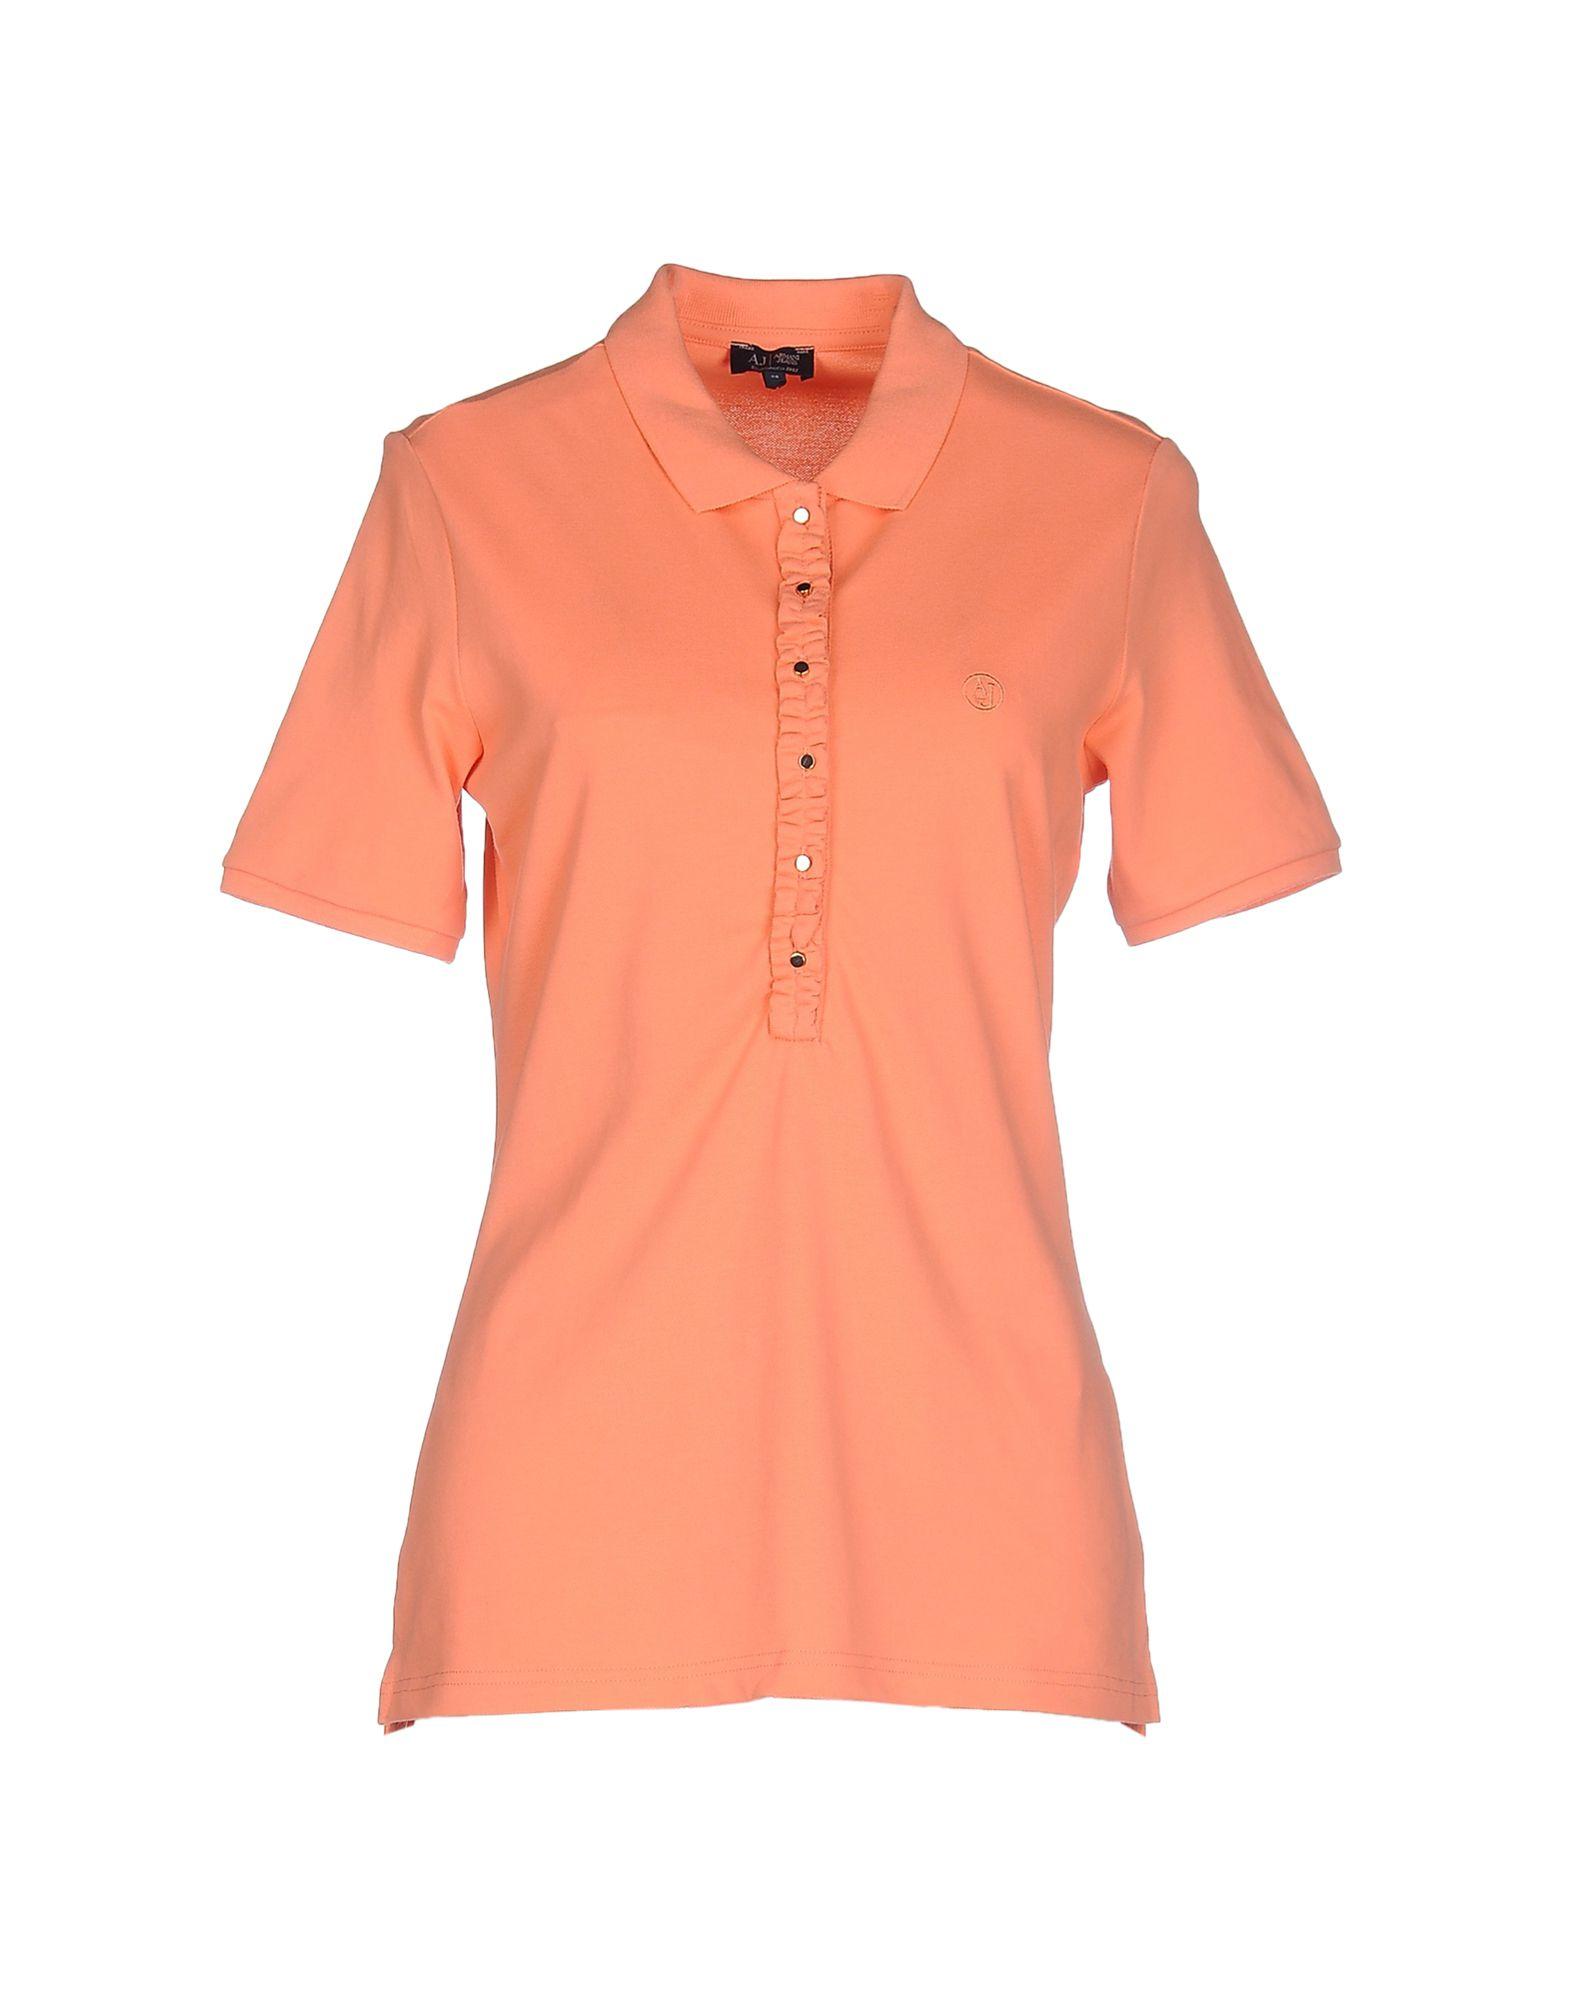 Armani Jeans Polo Shirt In Orange Lyst